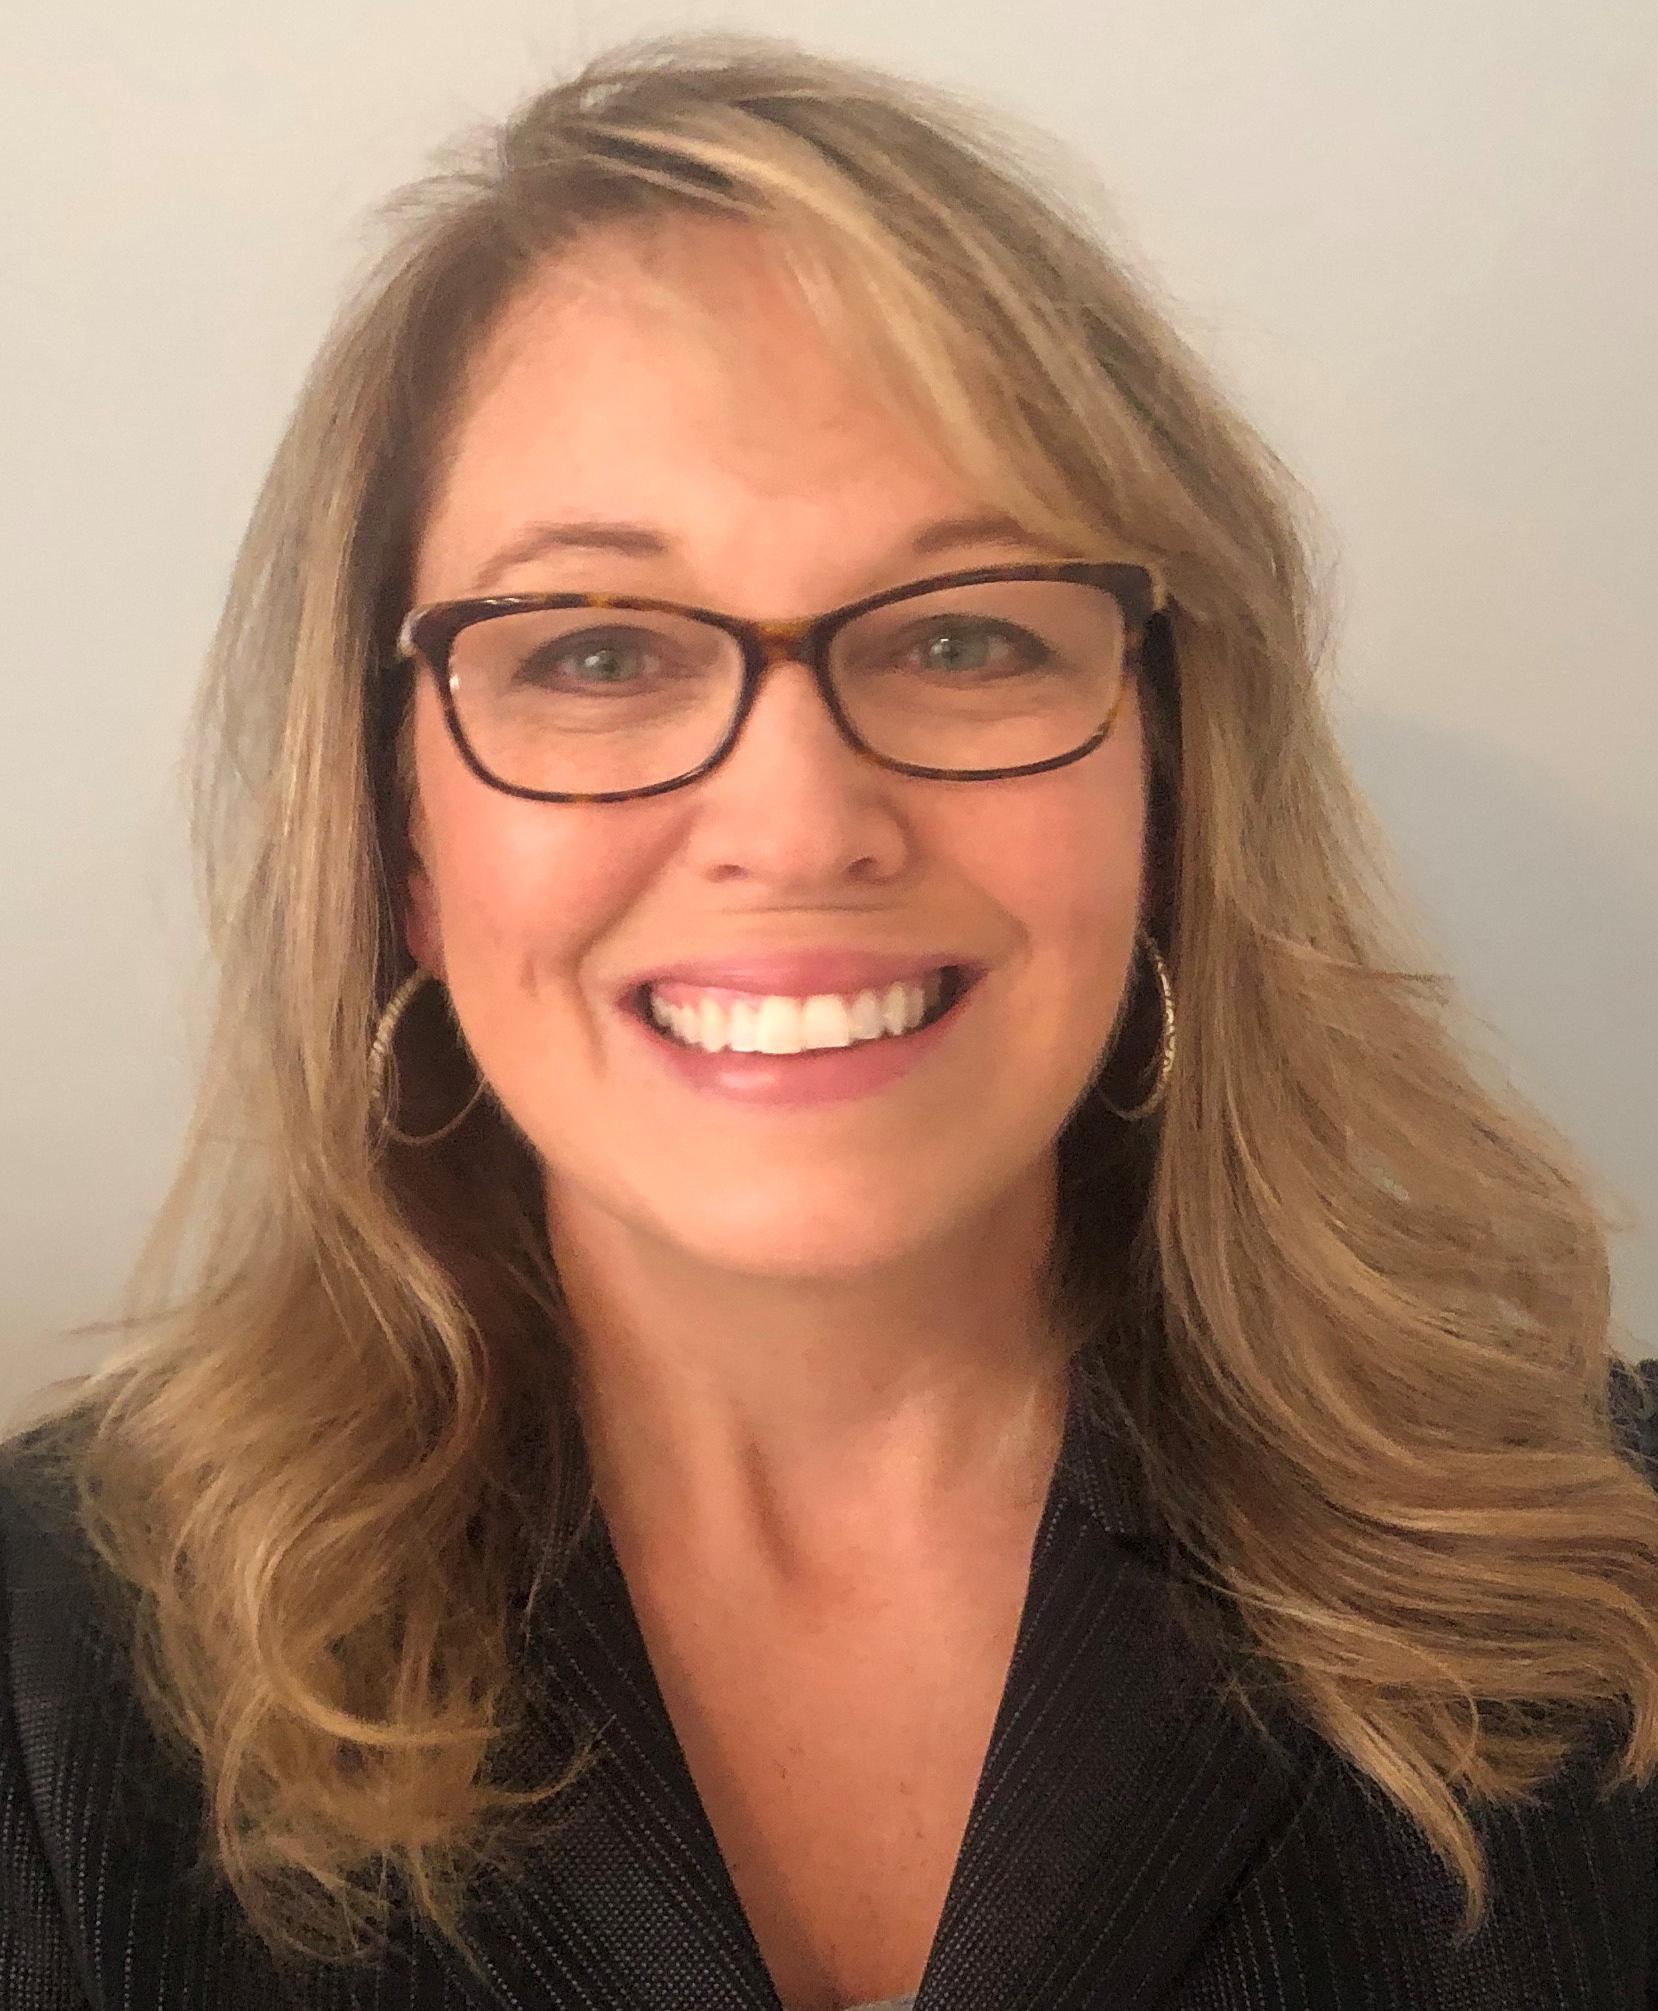 Robyn Meyer